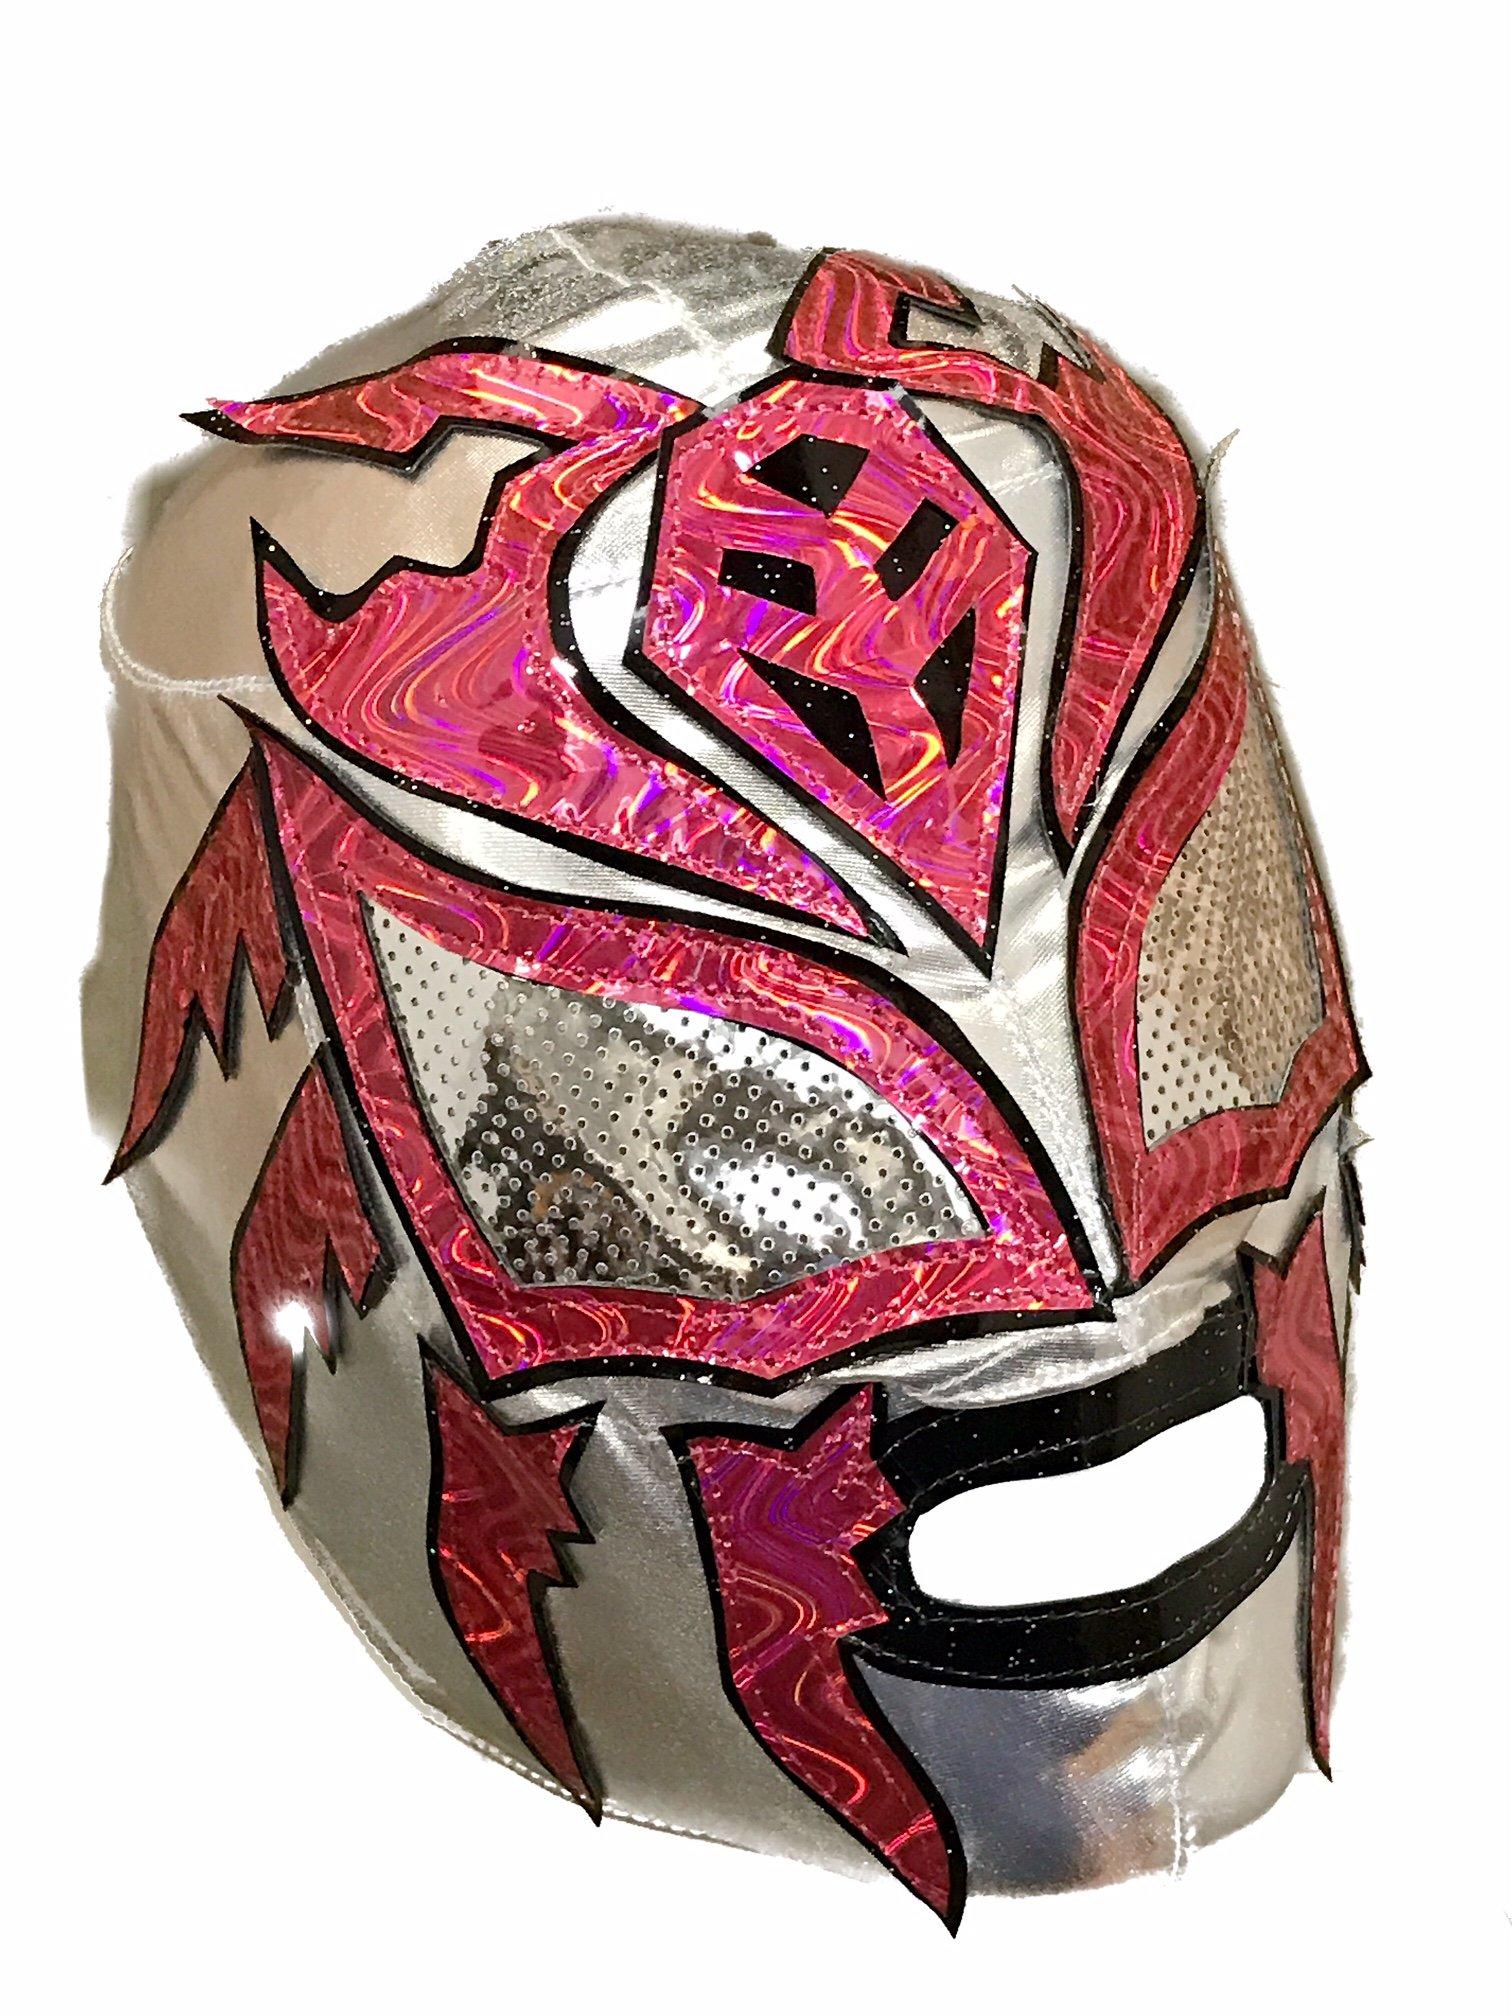 SOMBRA Lycra PRO Adult Lucha Libre Wrestling Mask (pro-LYCRA) Silver/Hot Pink by Mask Maniac